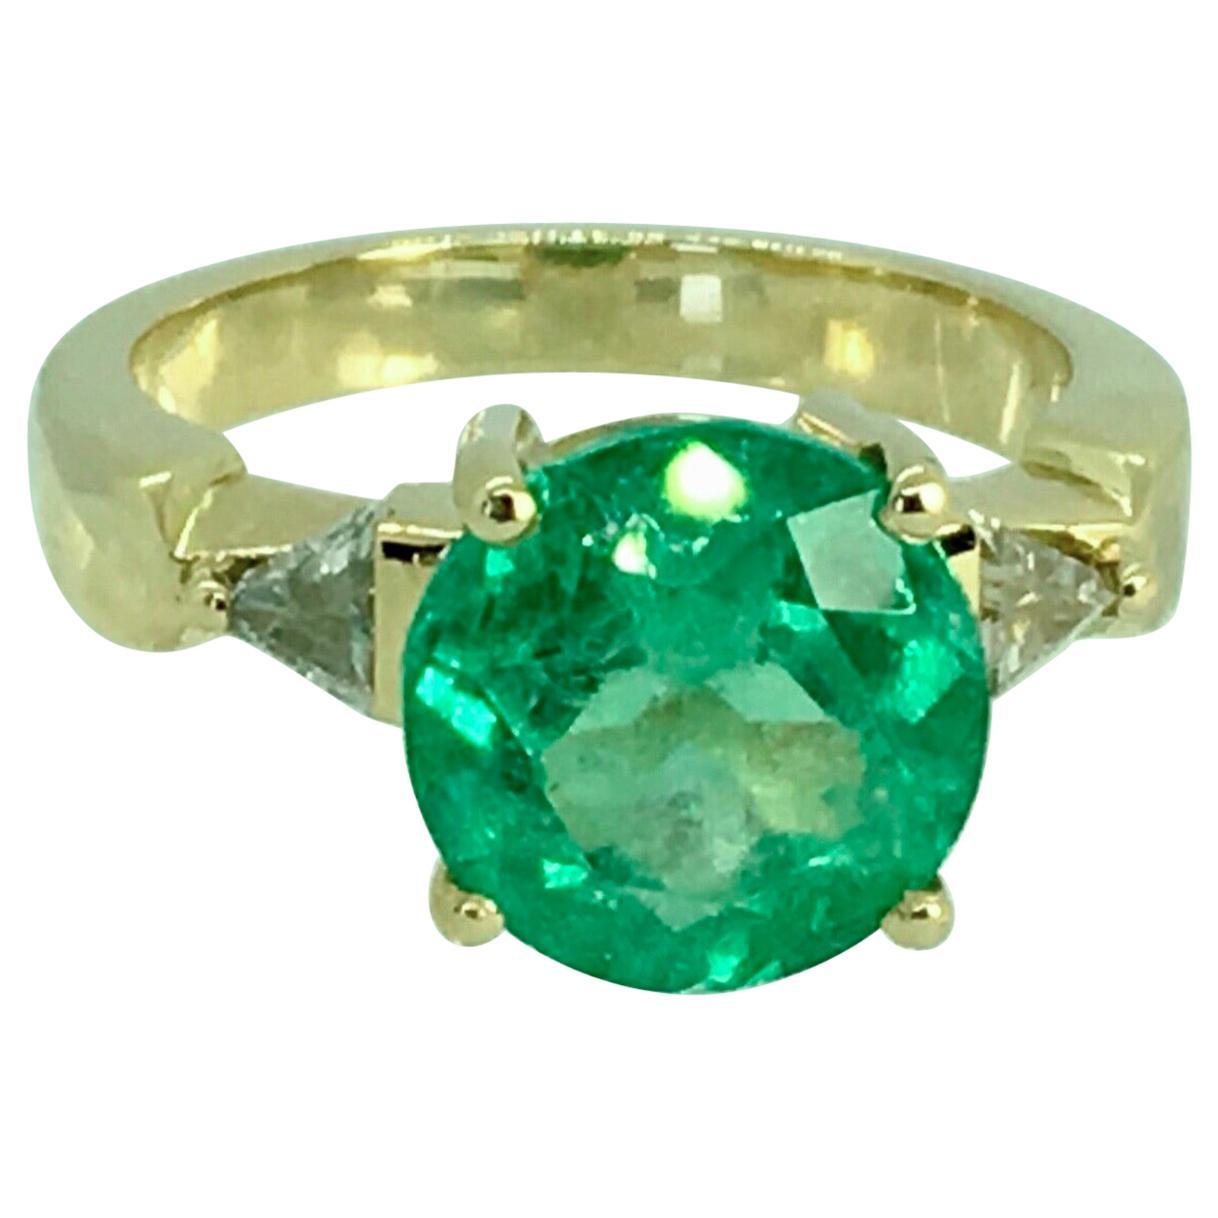 4.70 Carat Round Colombian Emerald Diamond Engagement Ring 18 Karat Gold